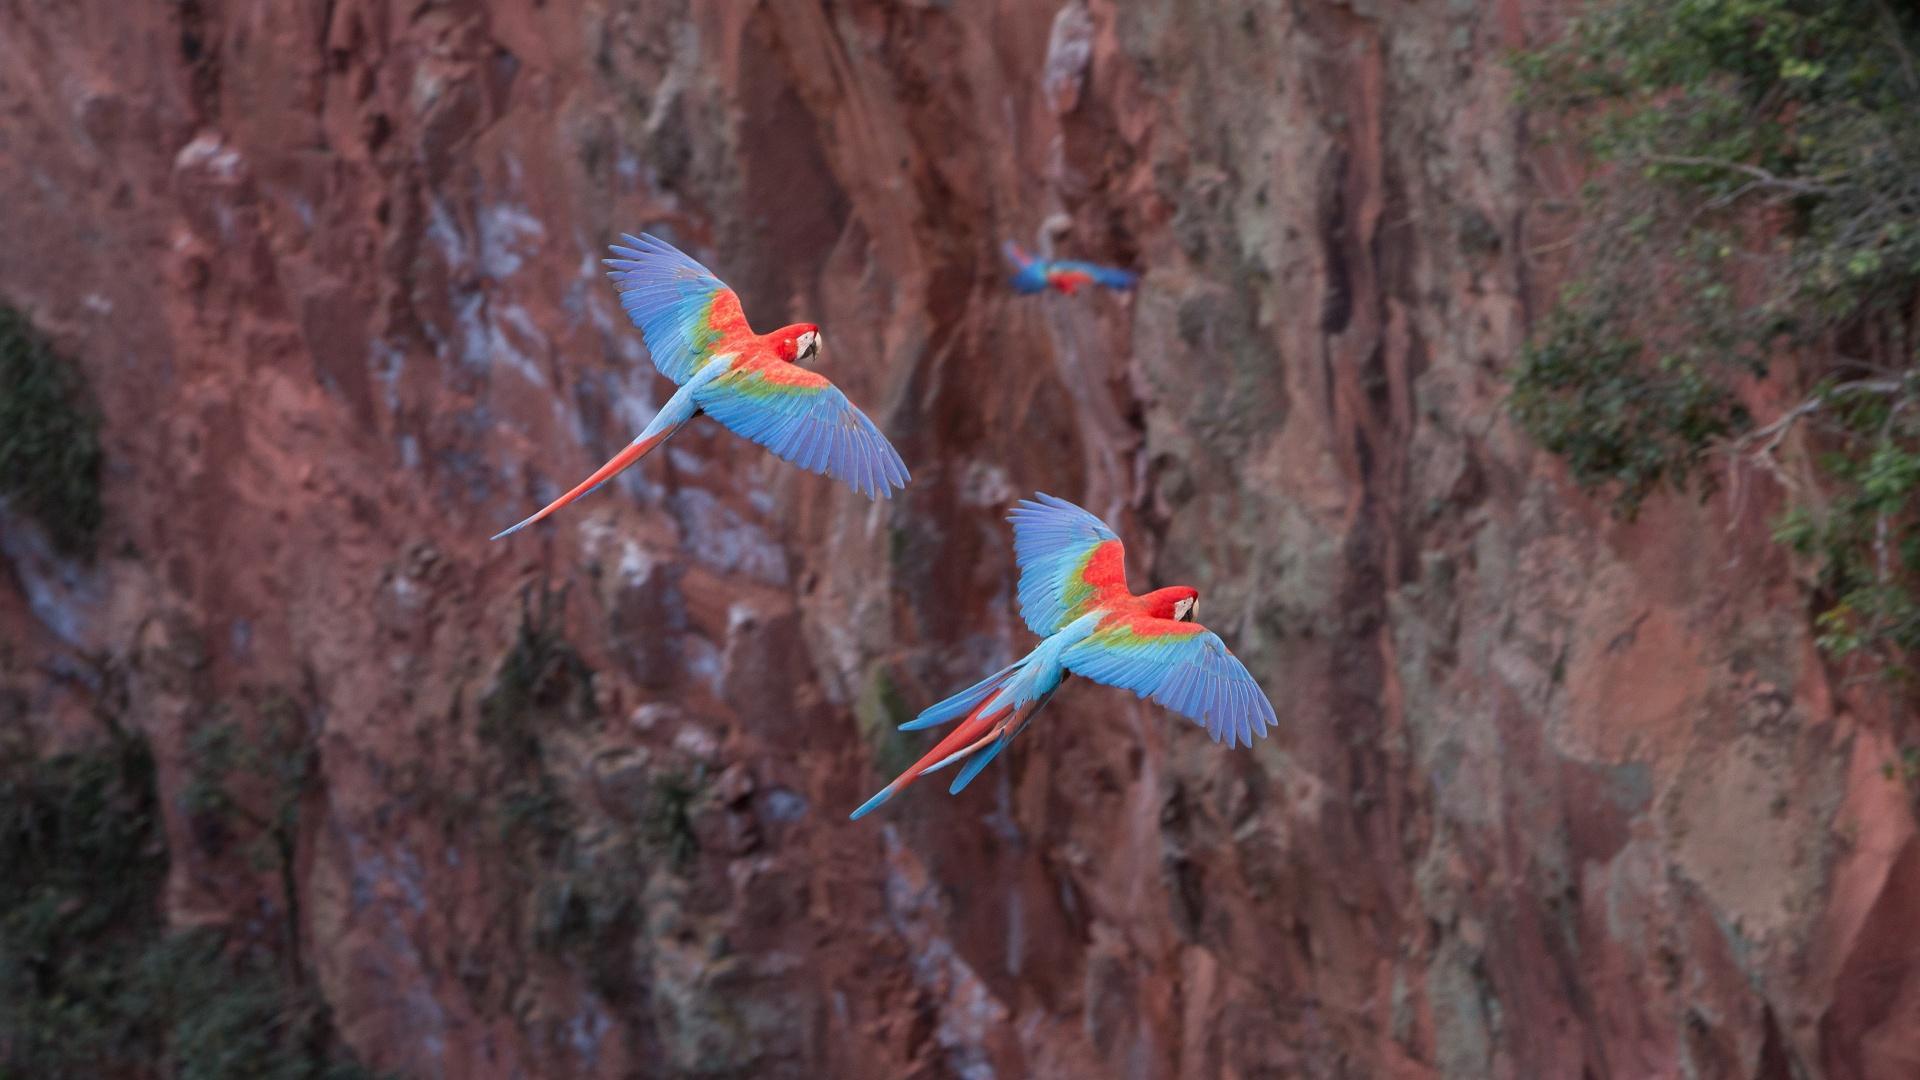 Rote Aras im Flug im Buraco das Araras bei Bonito